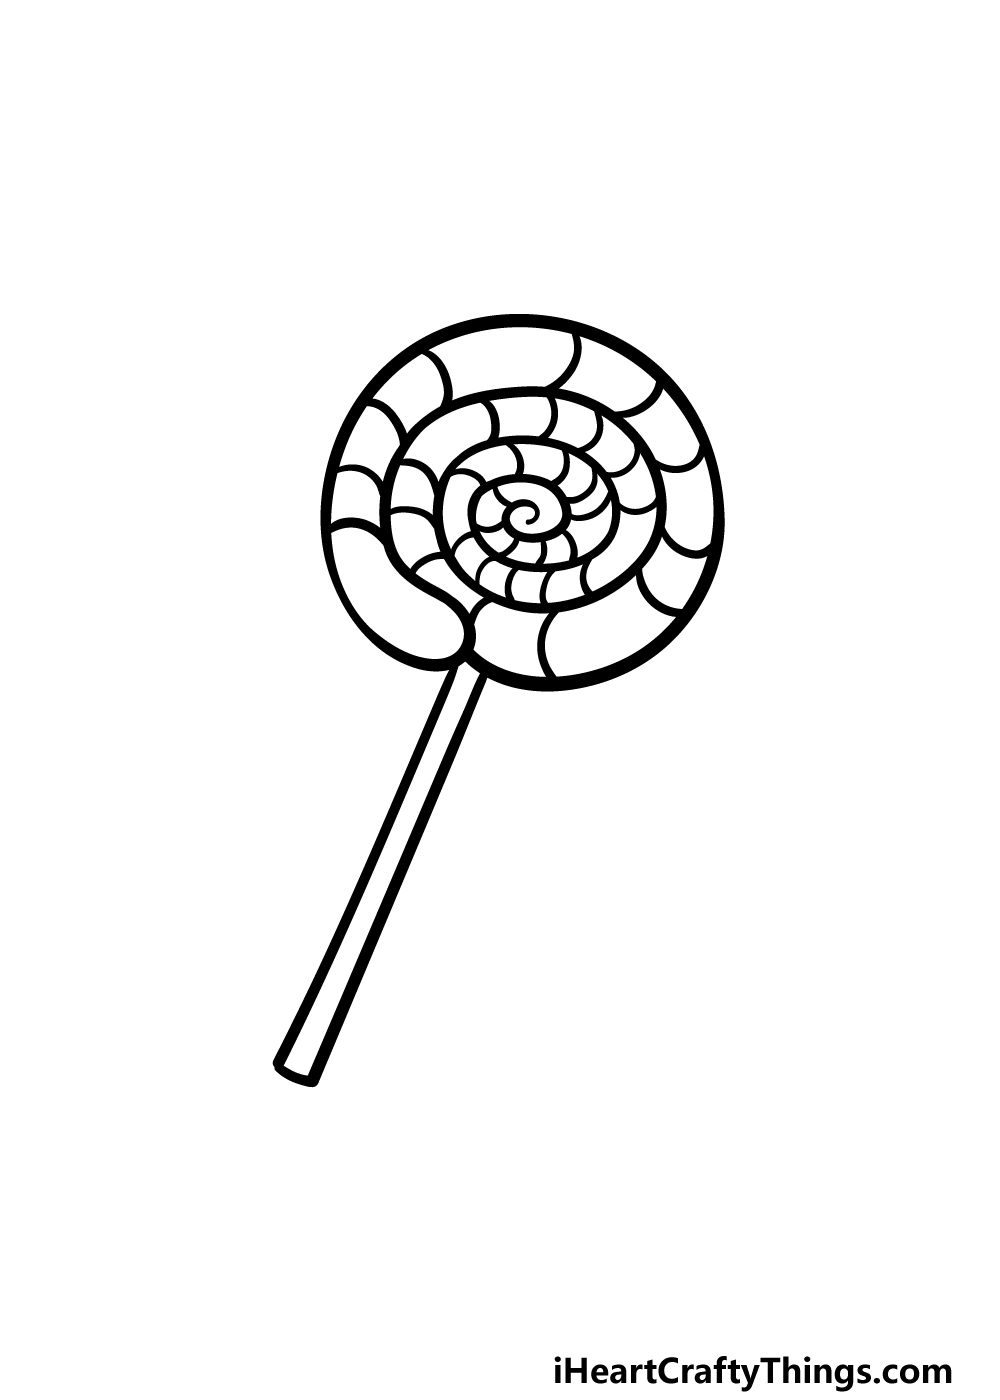 drawing a lollipop step 5